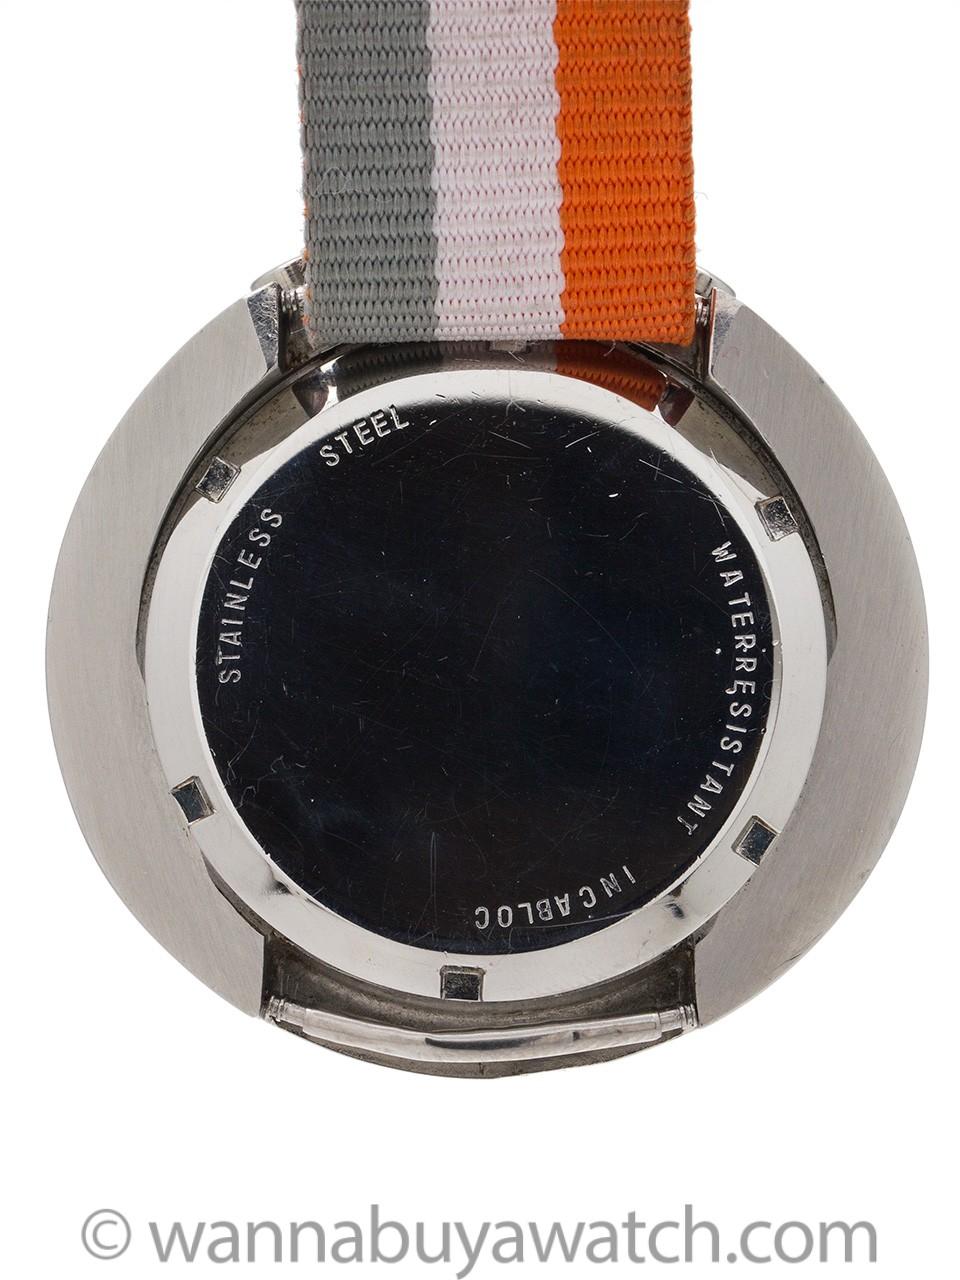 Junghans Bull's Head Chronograph Munich Olympics circa 1972